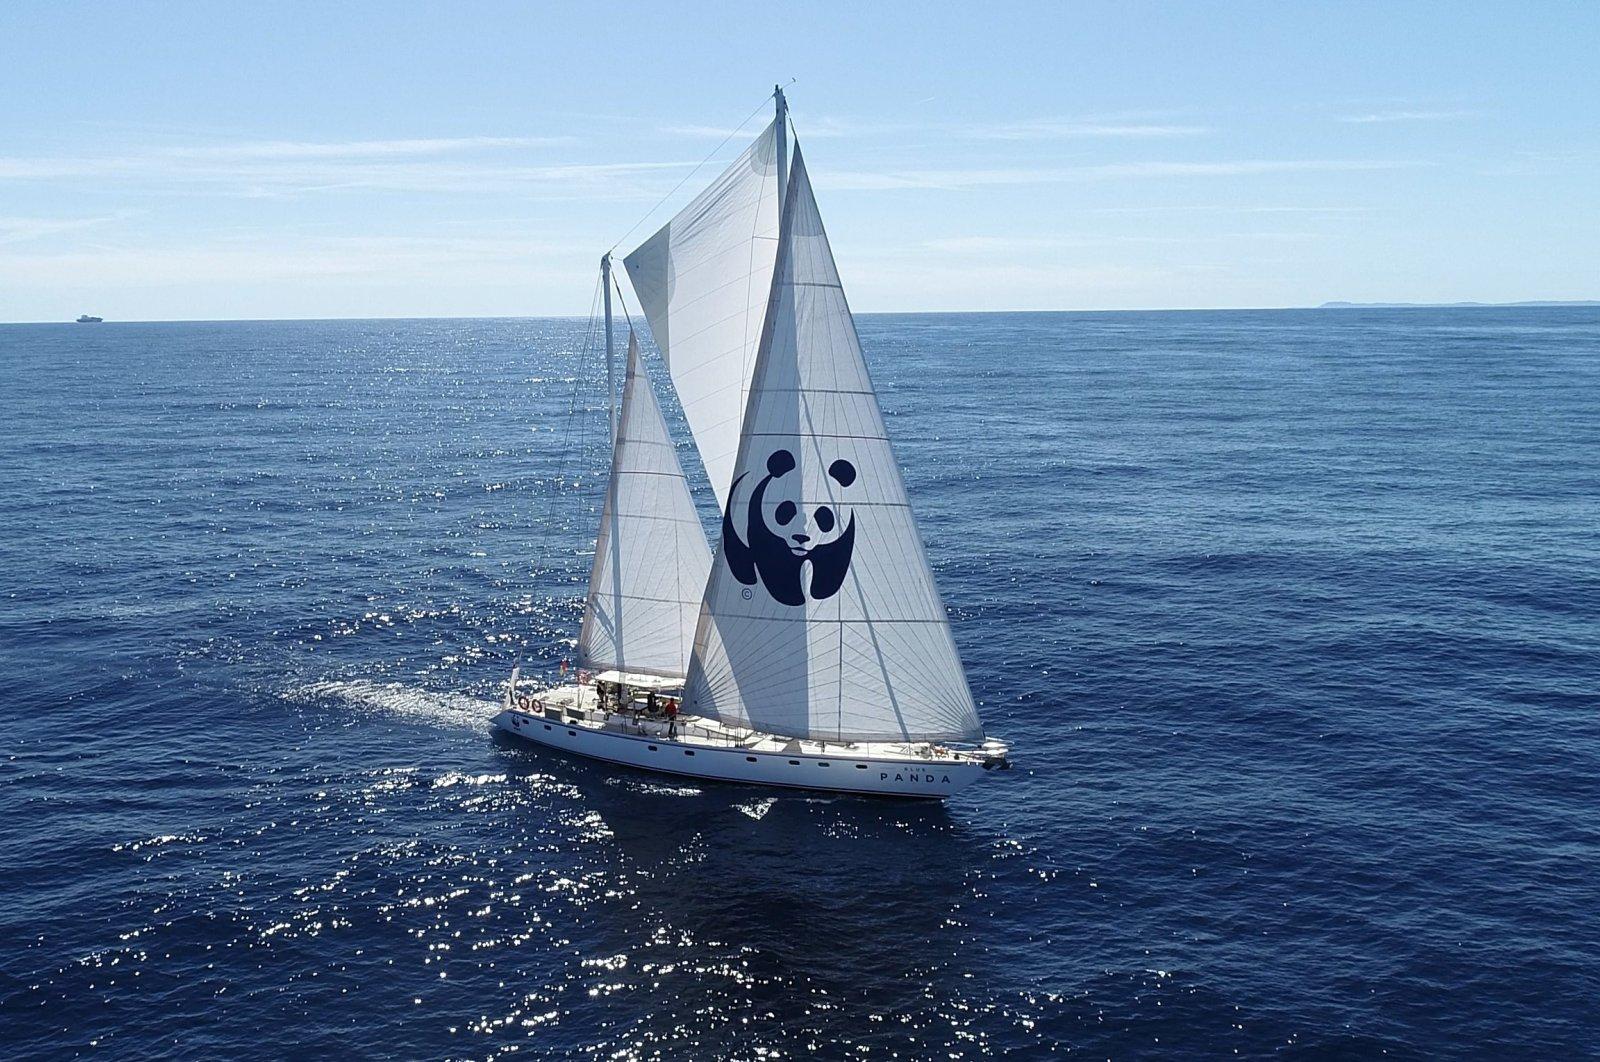 The World Wildlife Fund's ship Blue Panda.